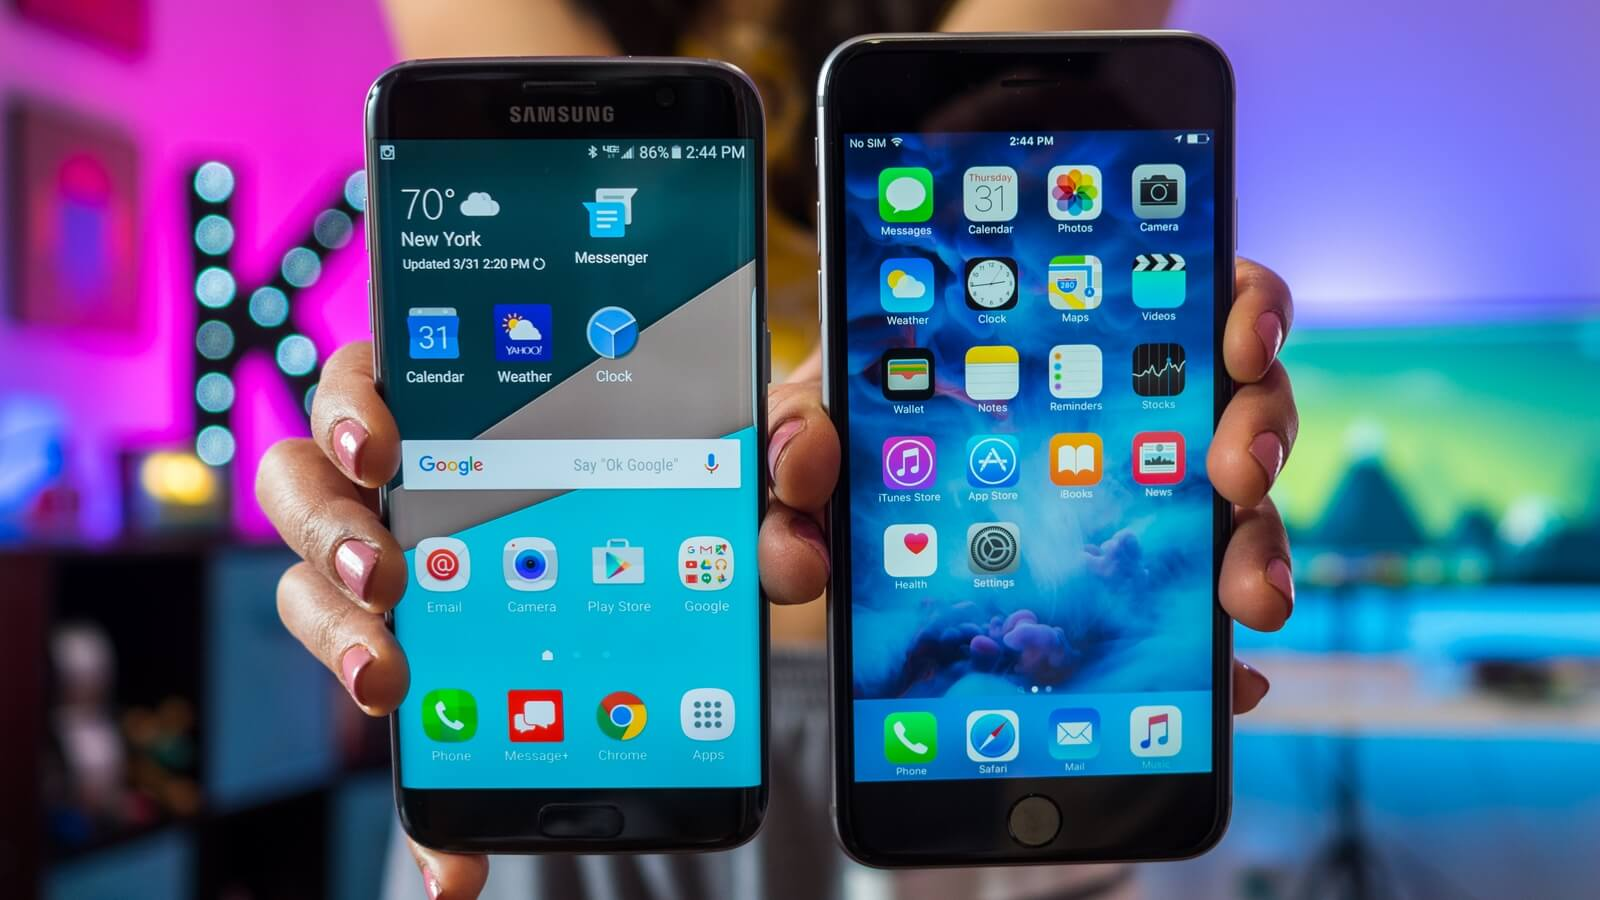 Galaxy S7 Edge vs. iPhone 6s Plus